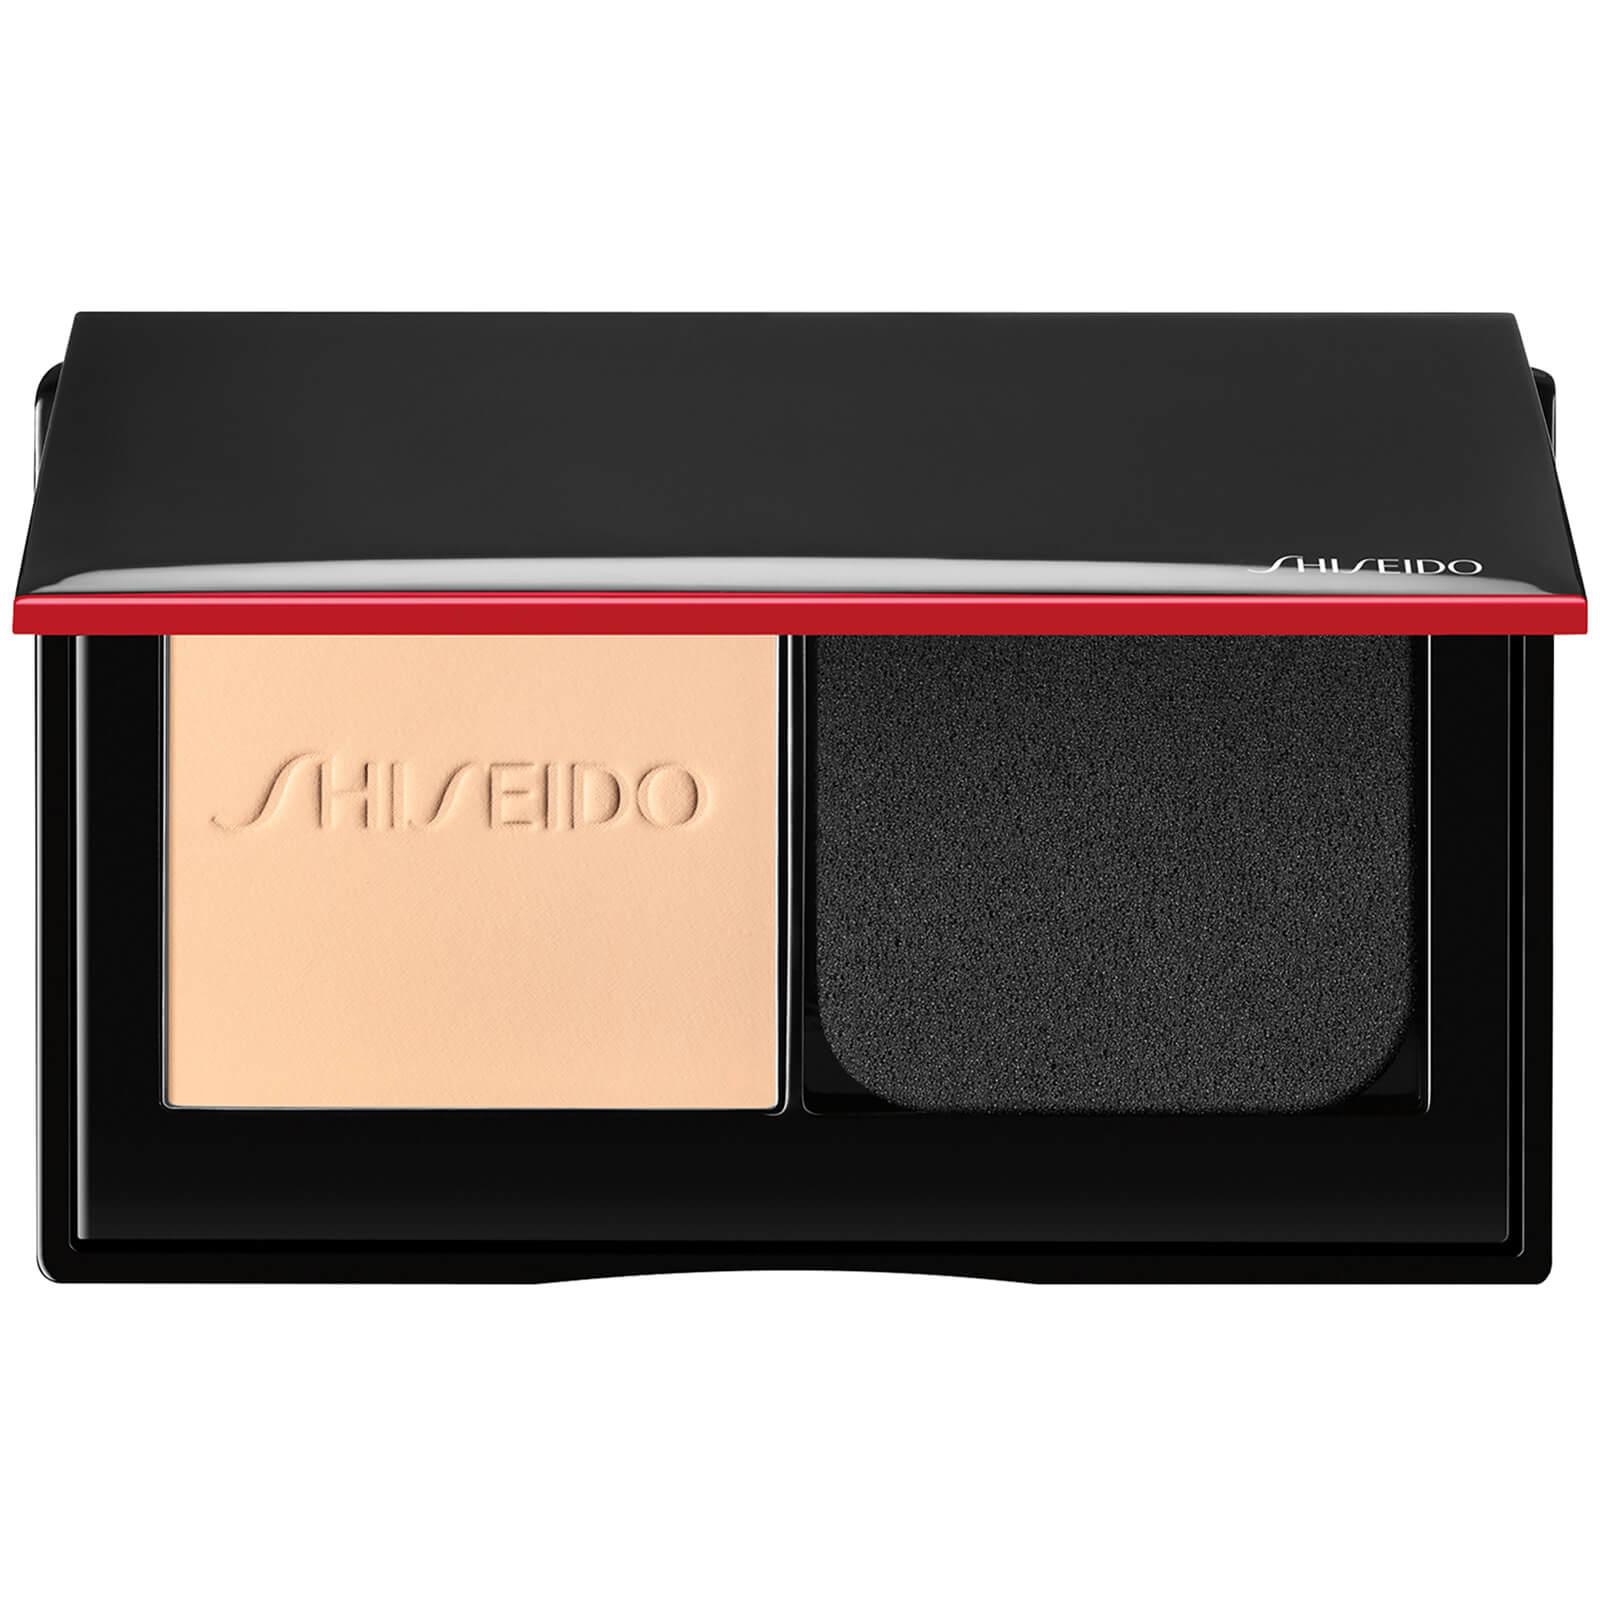 Shiseido Synchro Skin Self-Refreshing Custom Finish Powder Foundation 9g (Various Shades) - Opal